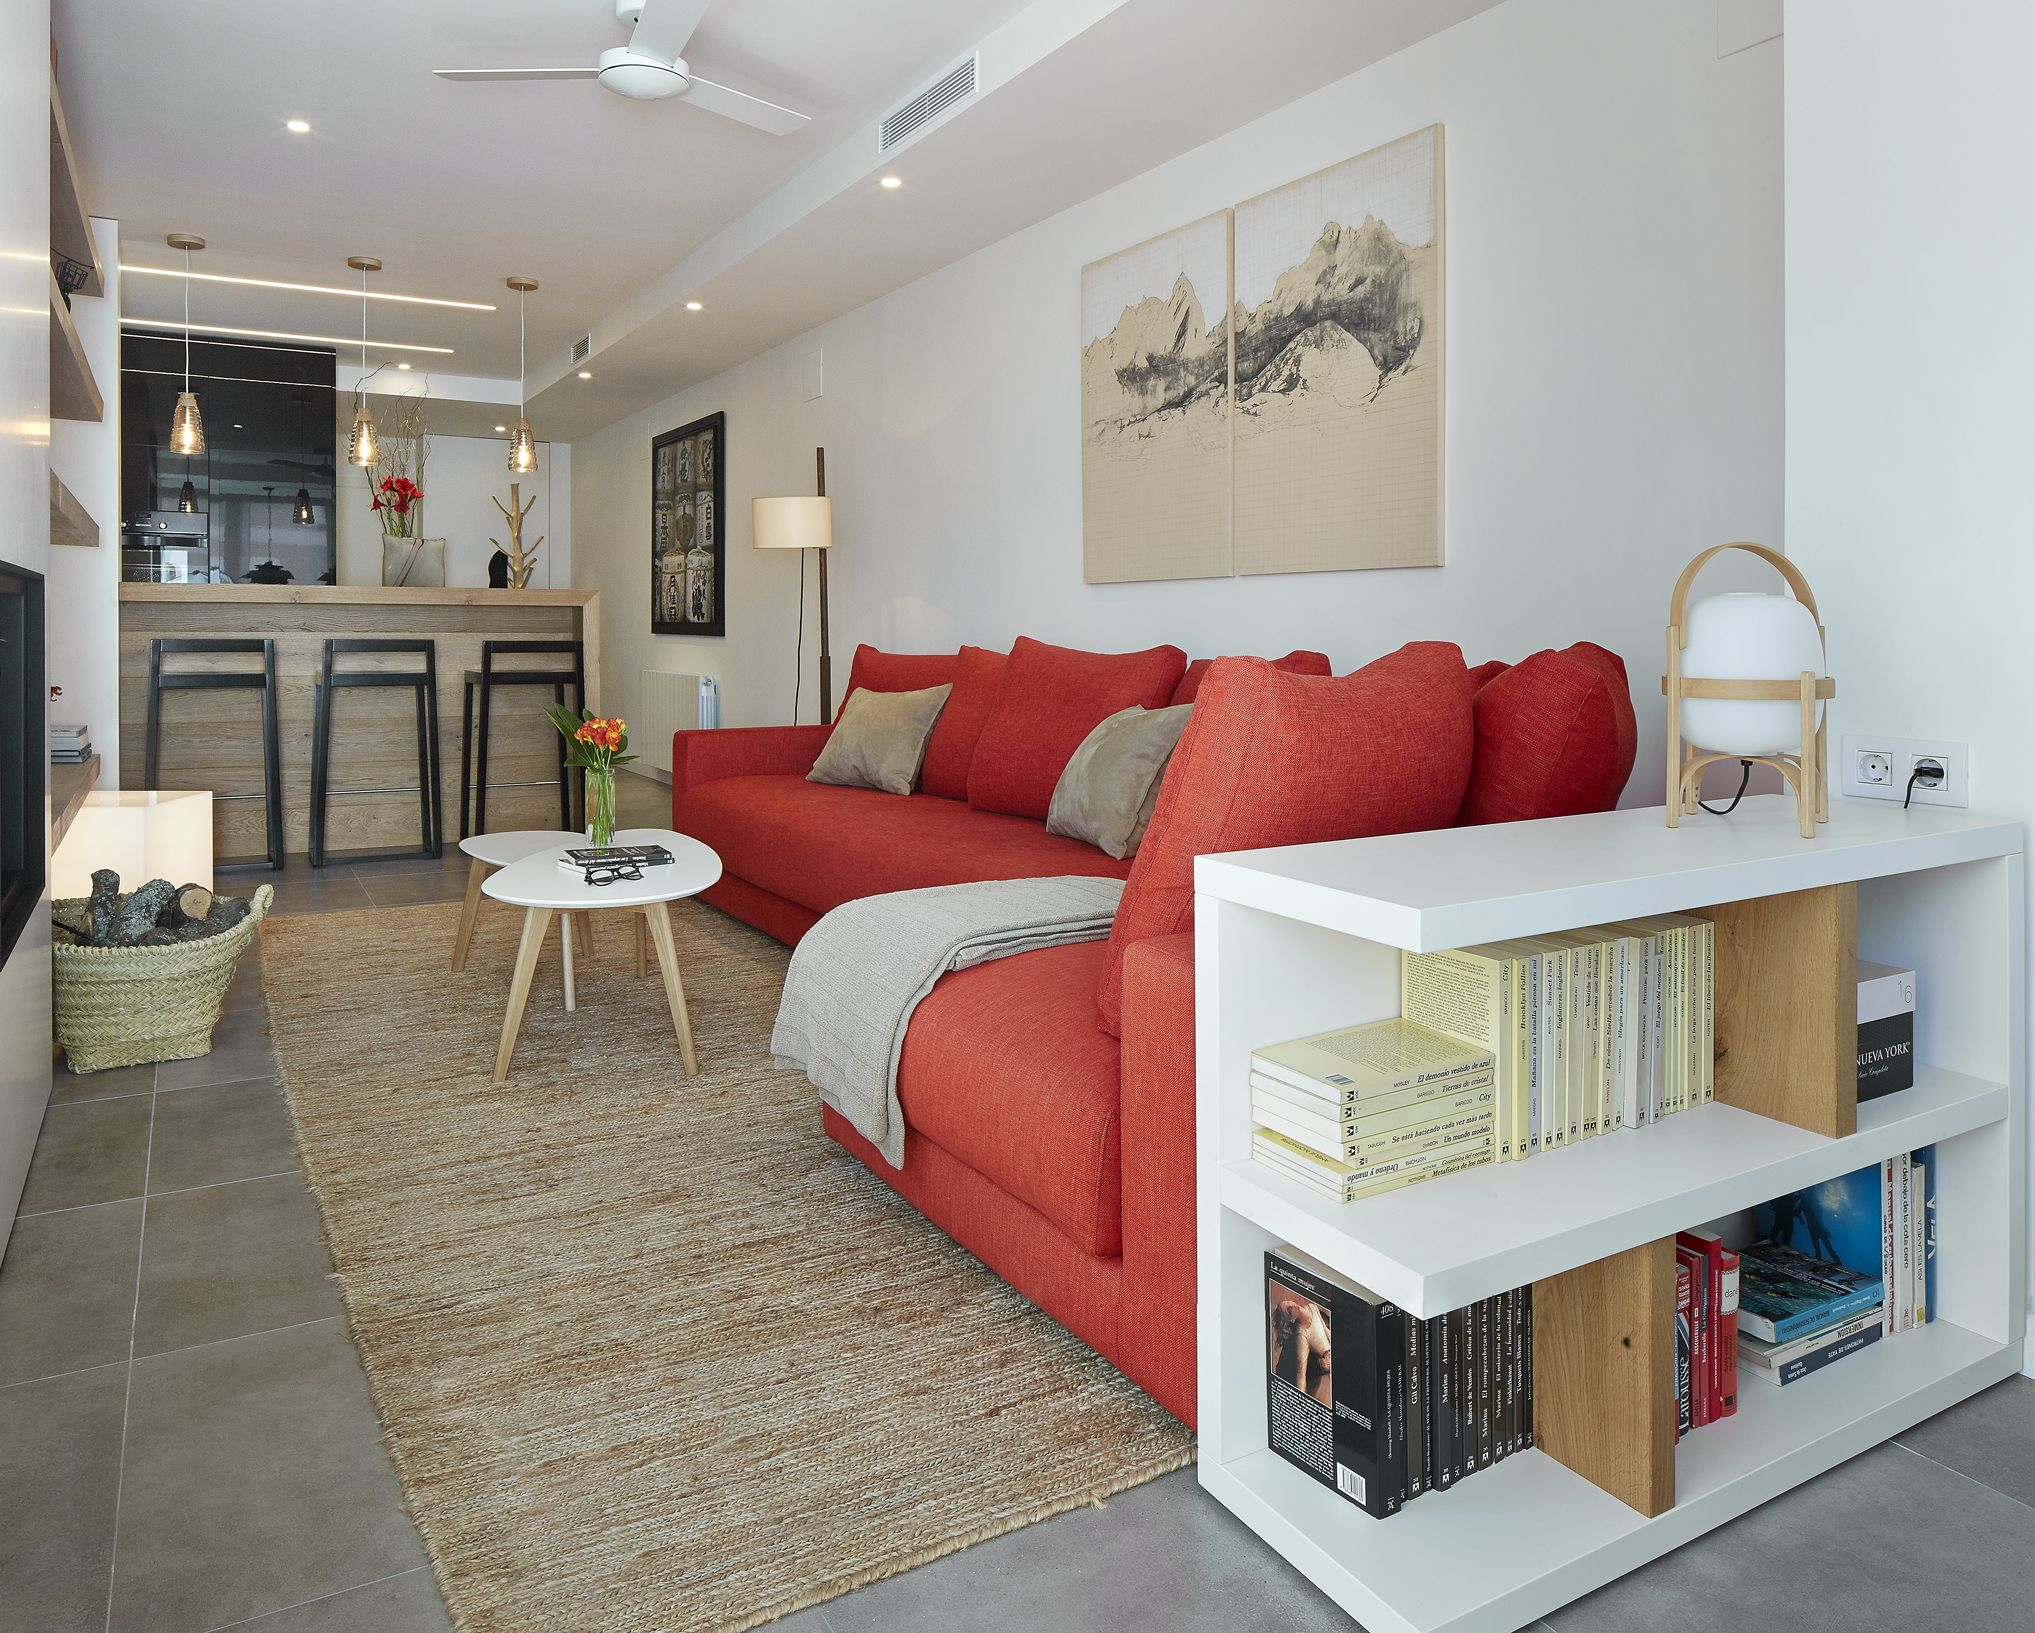 Molins interiors arquitectura interior interiorismo - Decoracion alfombras salon ...